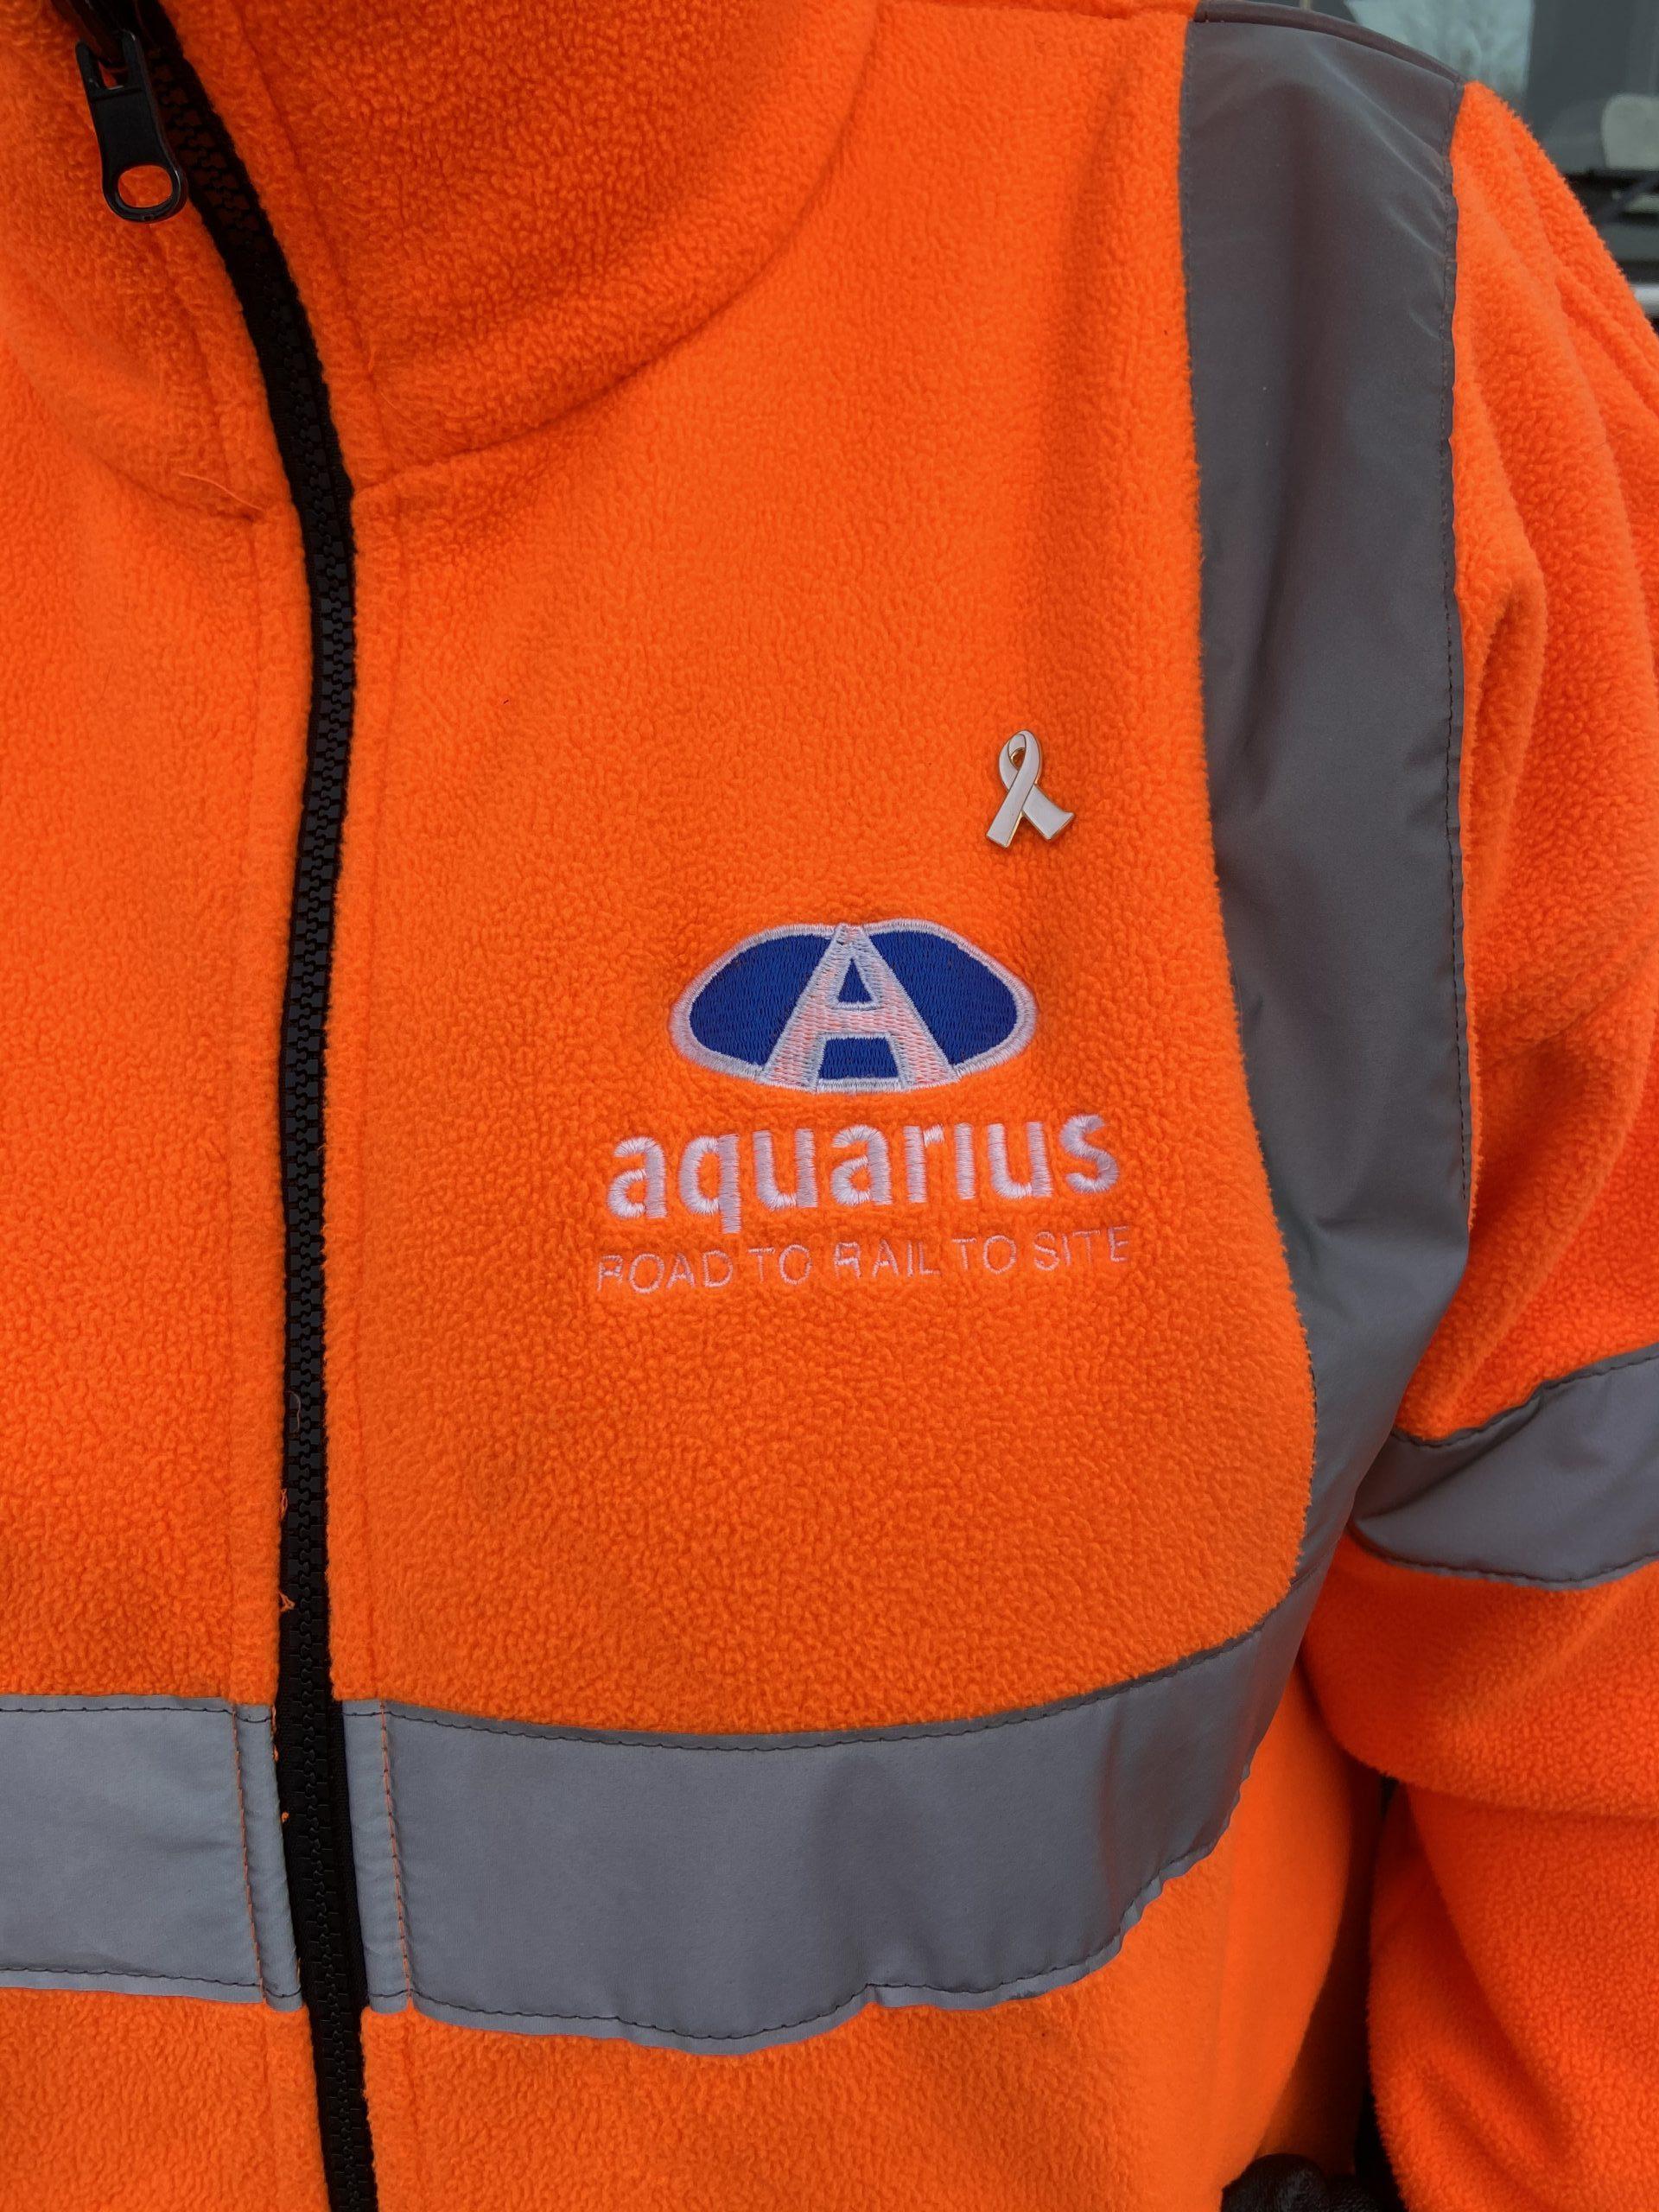 Aquarius Rail supports White Ribbon UK